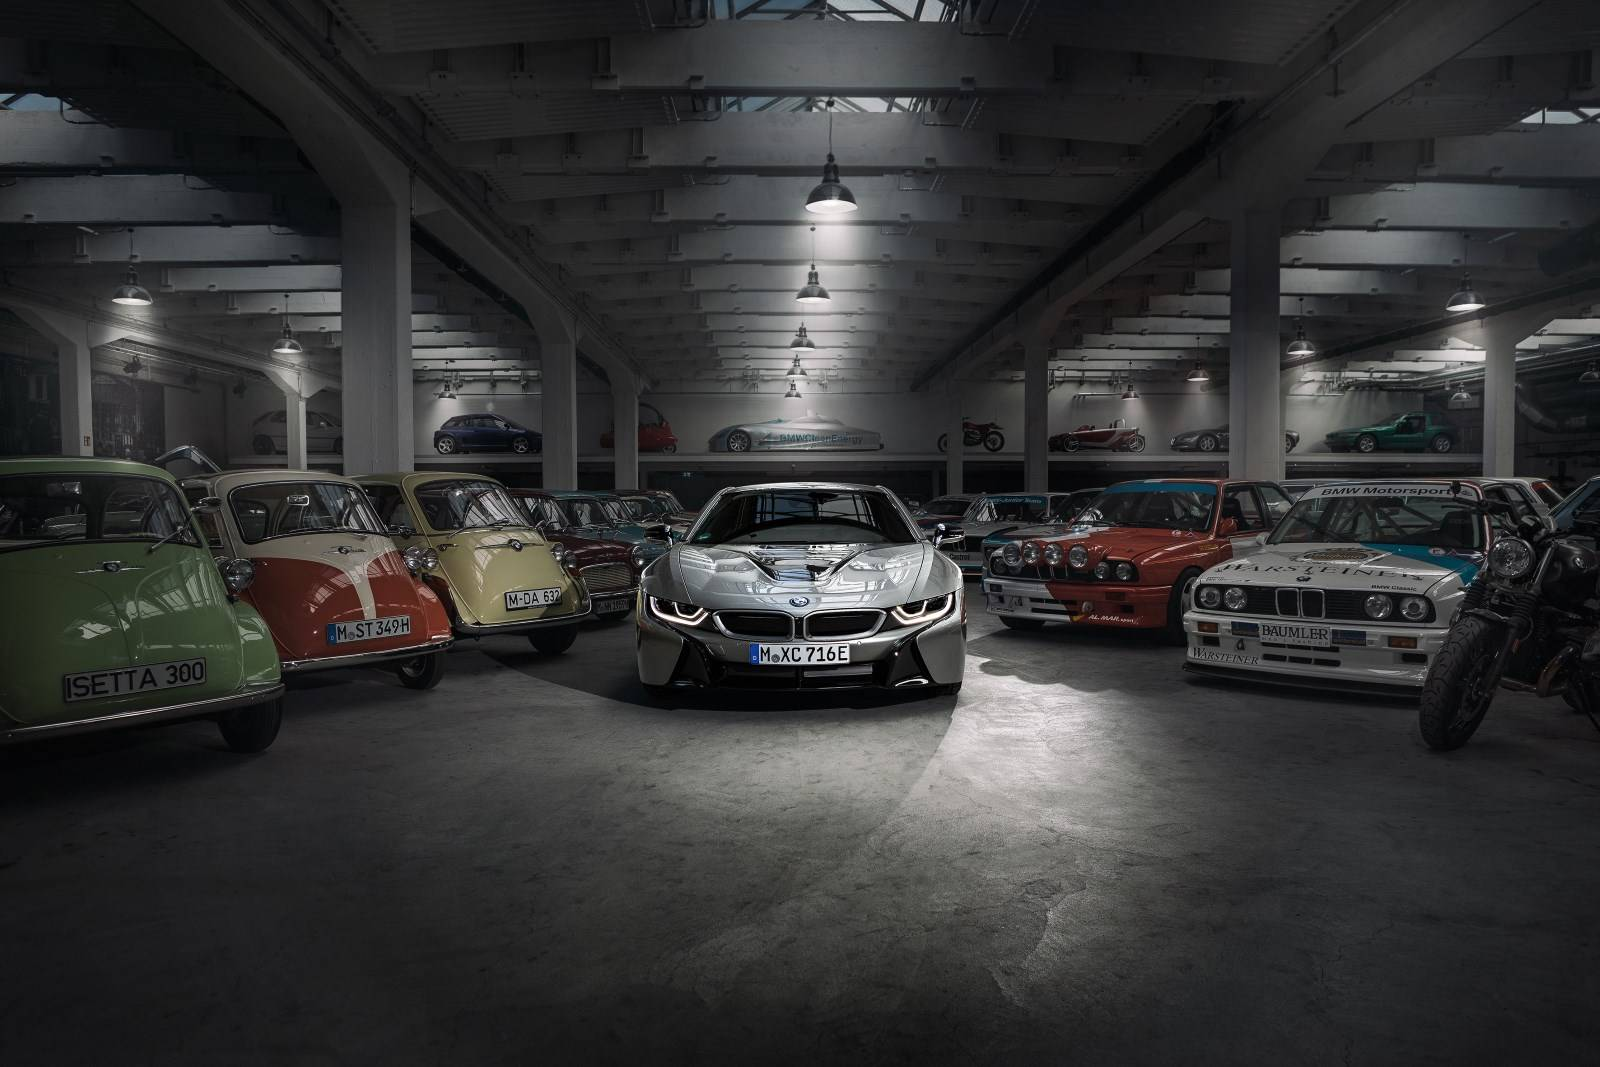 BMW i8 уходит в музей - BMW Group прекращает производство гибрида 1